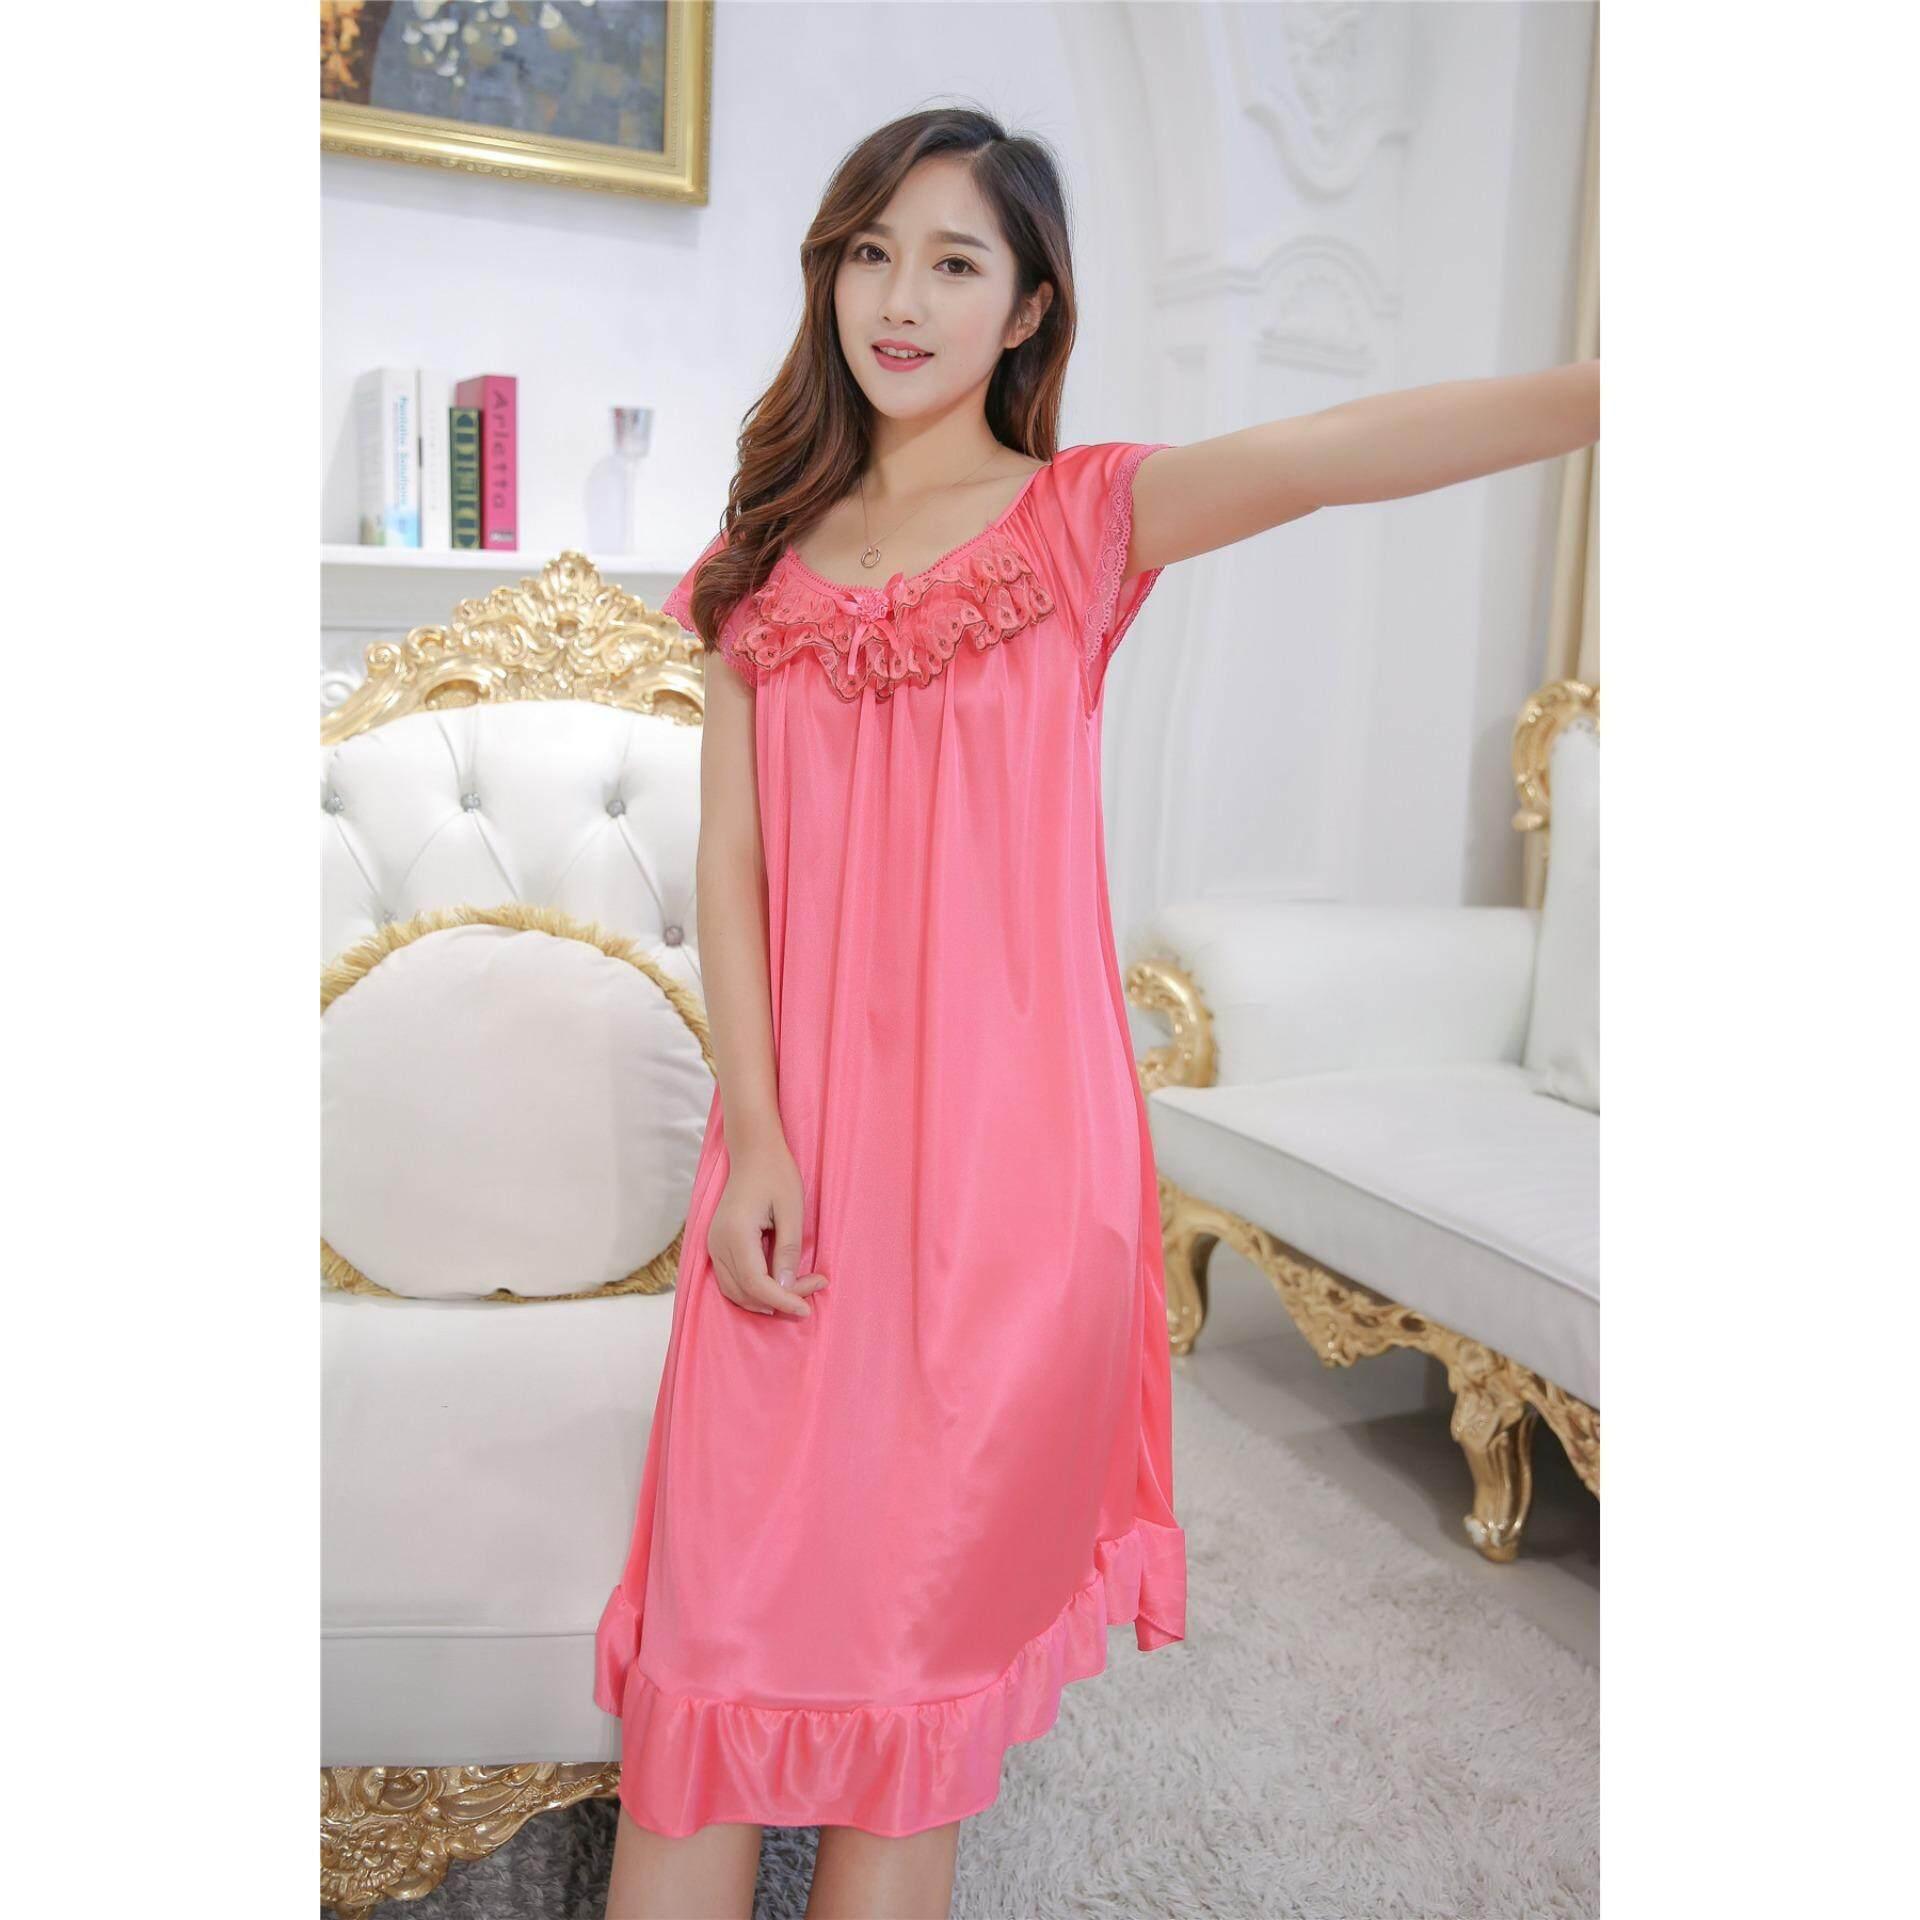 479f883a0 Bolster Store Ladies Women Sexy lingerie Sleepwear Short Sleeve ...